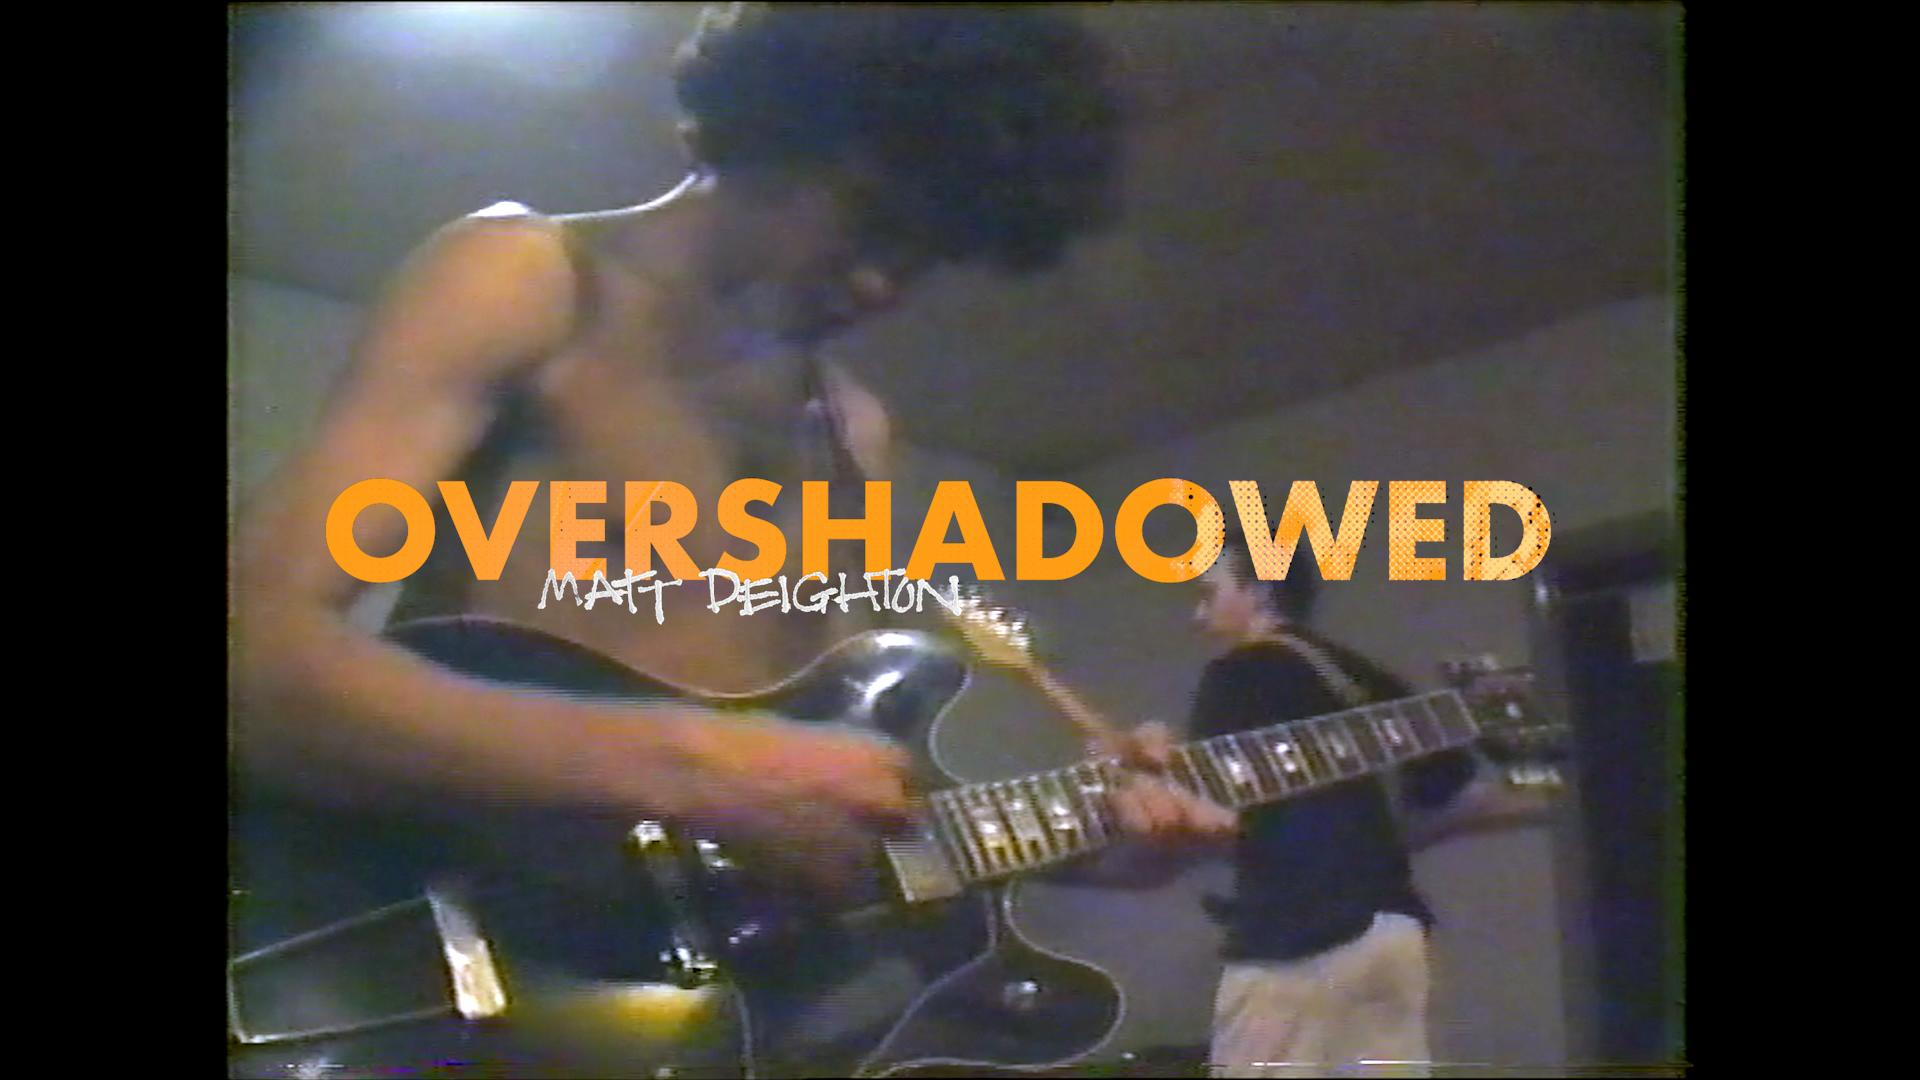 Overshadowed